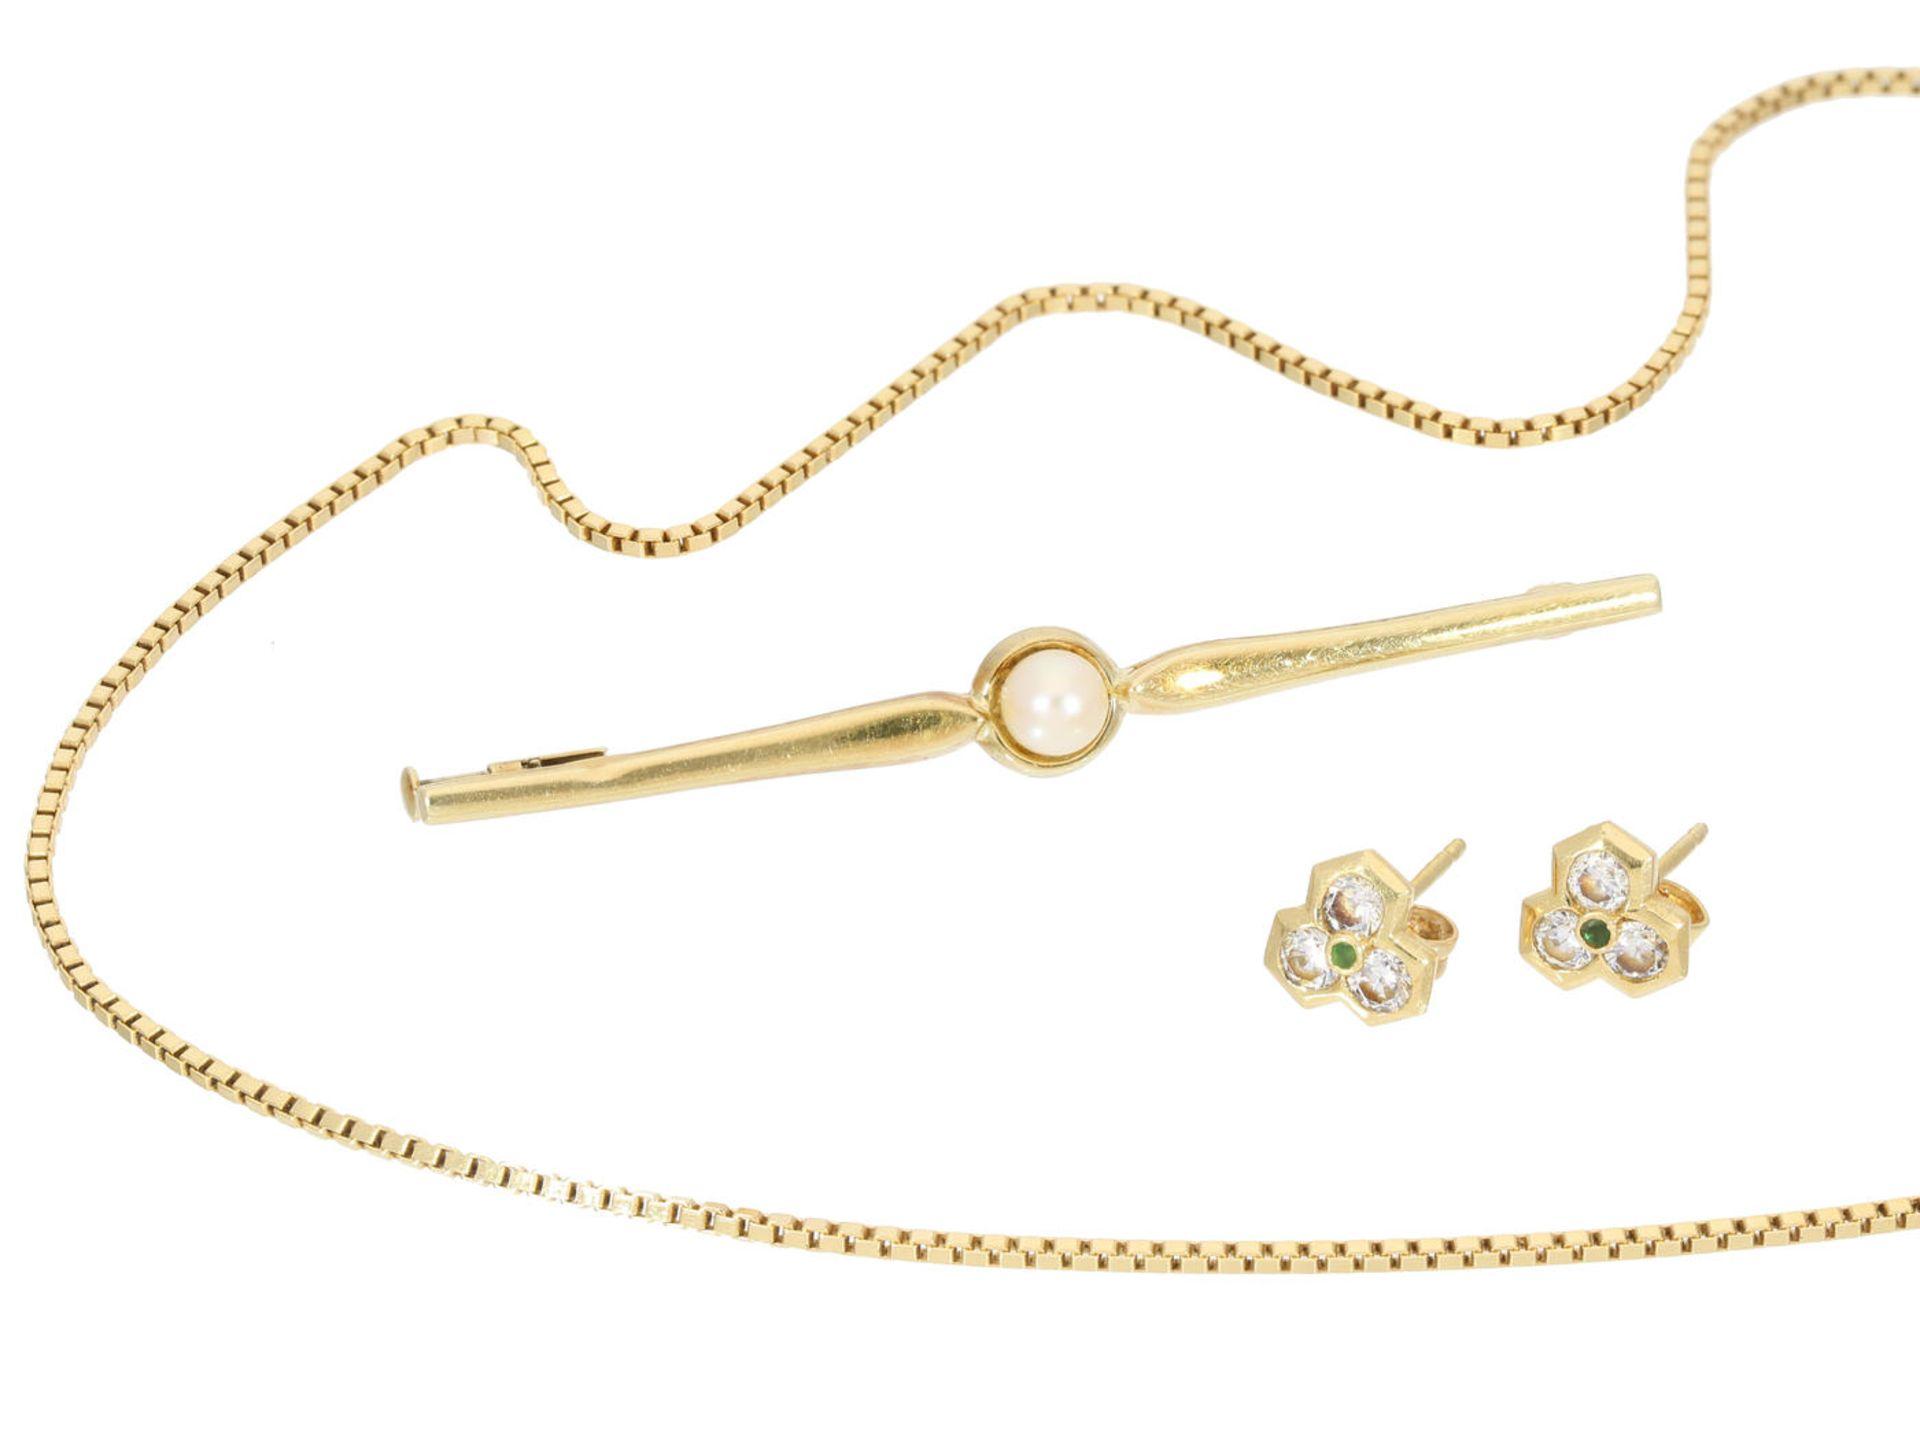 Los 6022 - Kette/Brosche/Ohrstecker: Konvolut vintage Goldschmuck 1. feine Goldkette, ca. 40cm lang, ca. 3,